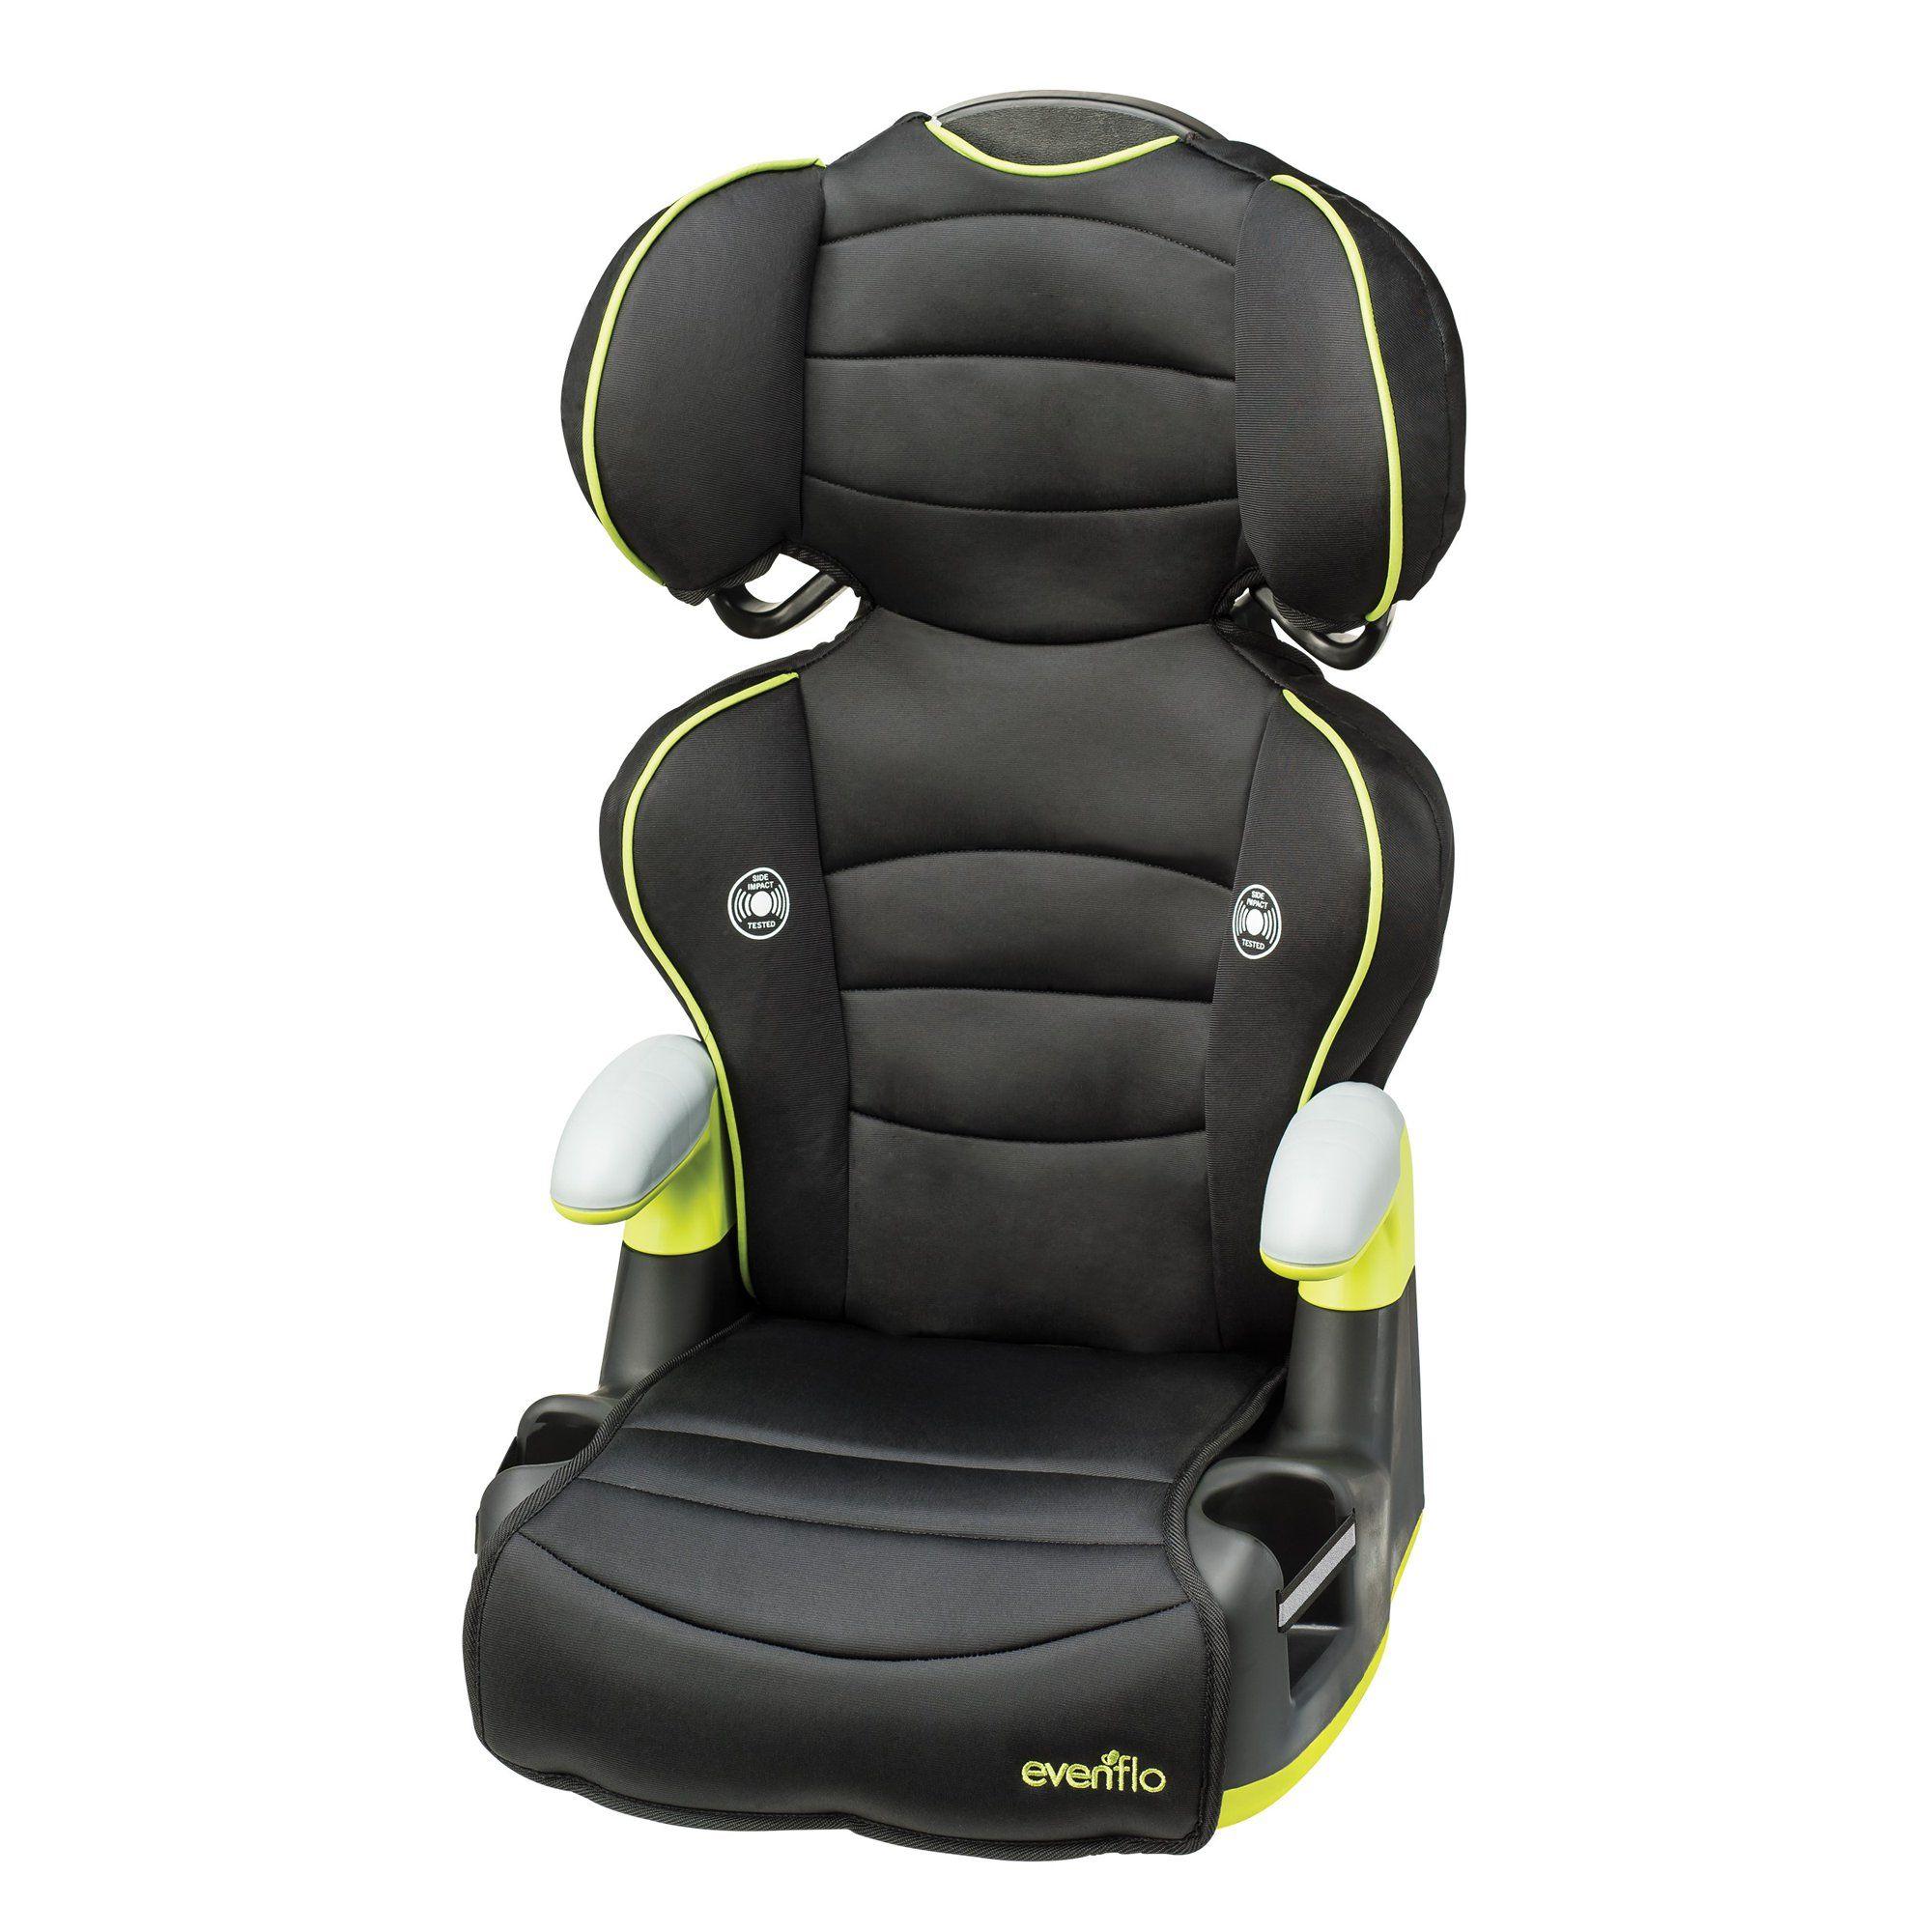 SALE EVENFLO BIG KID LX HIGH BACK BOOSTER CAR SEAT NAPERVILLE